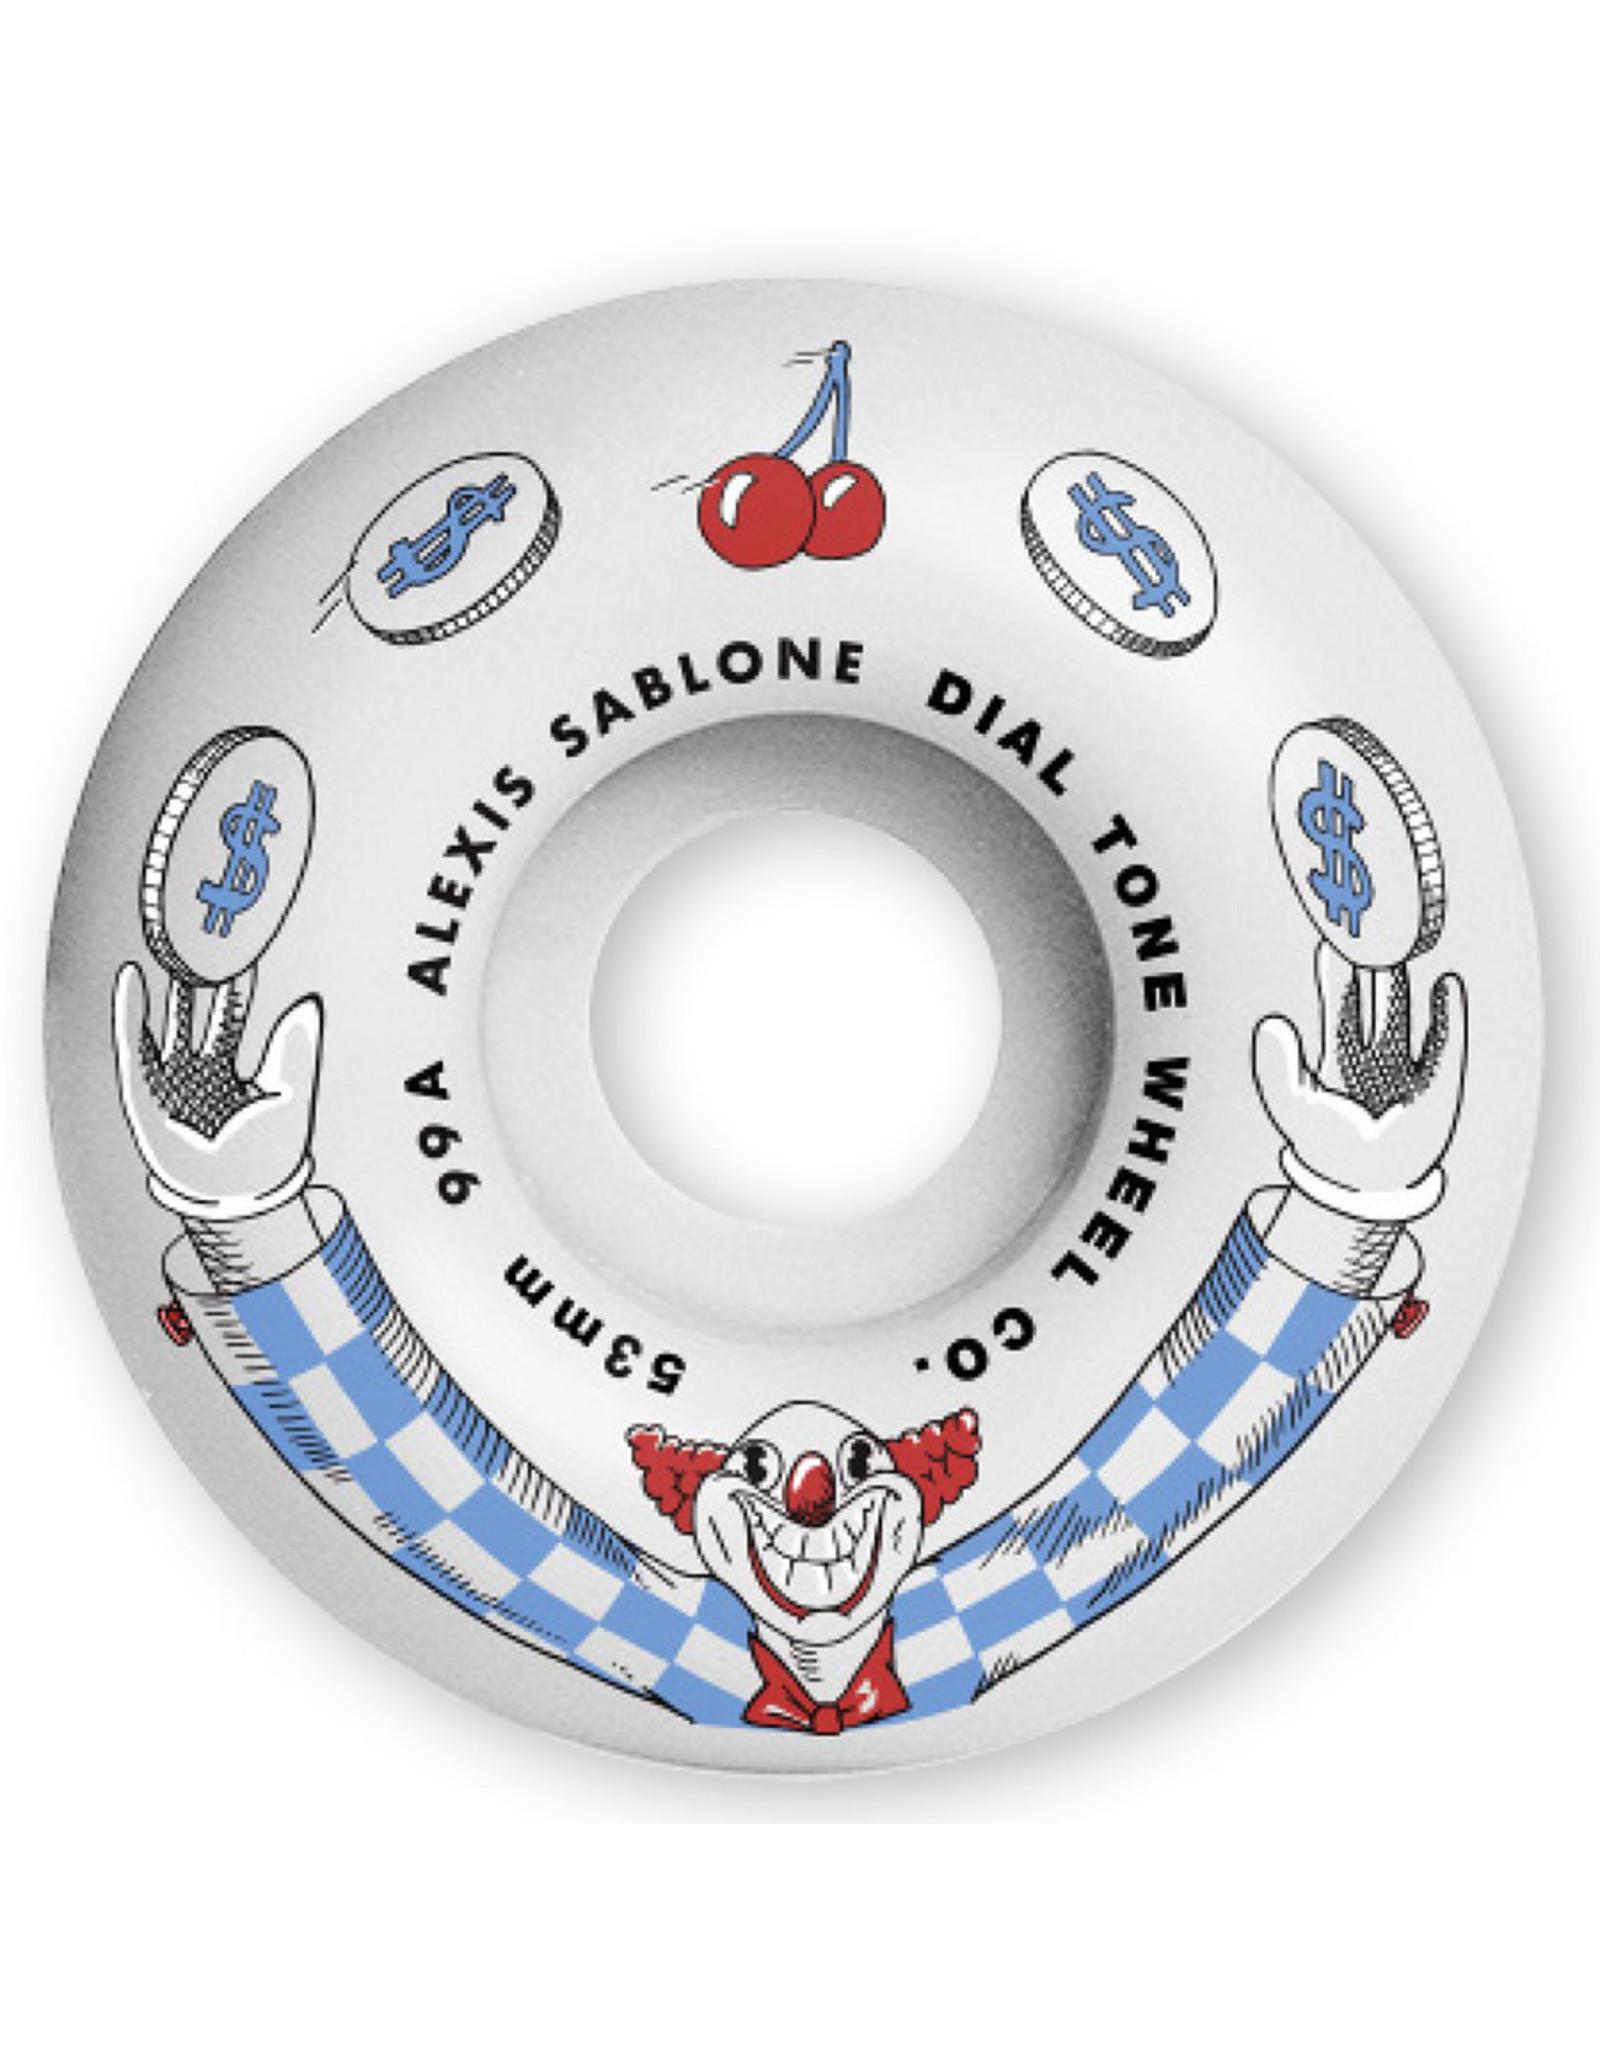 Dial Tone Dial Tone Wheels Sablone Wisecracker Standard (51mm/99a)